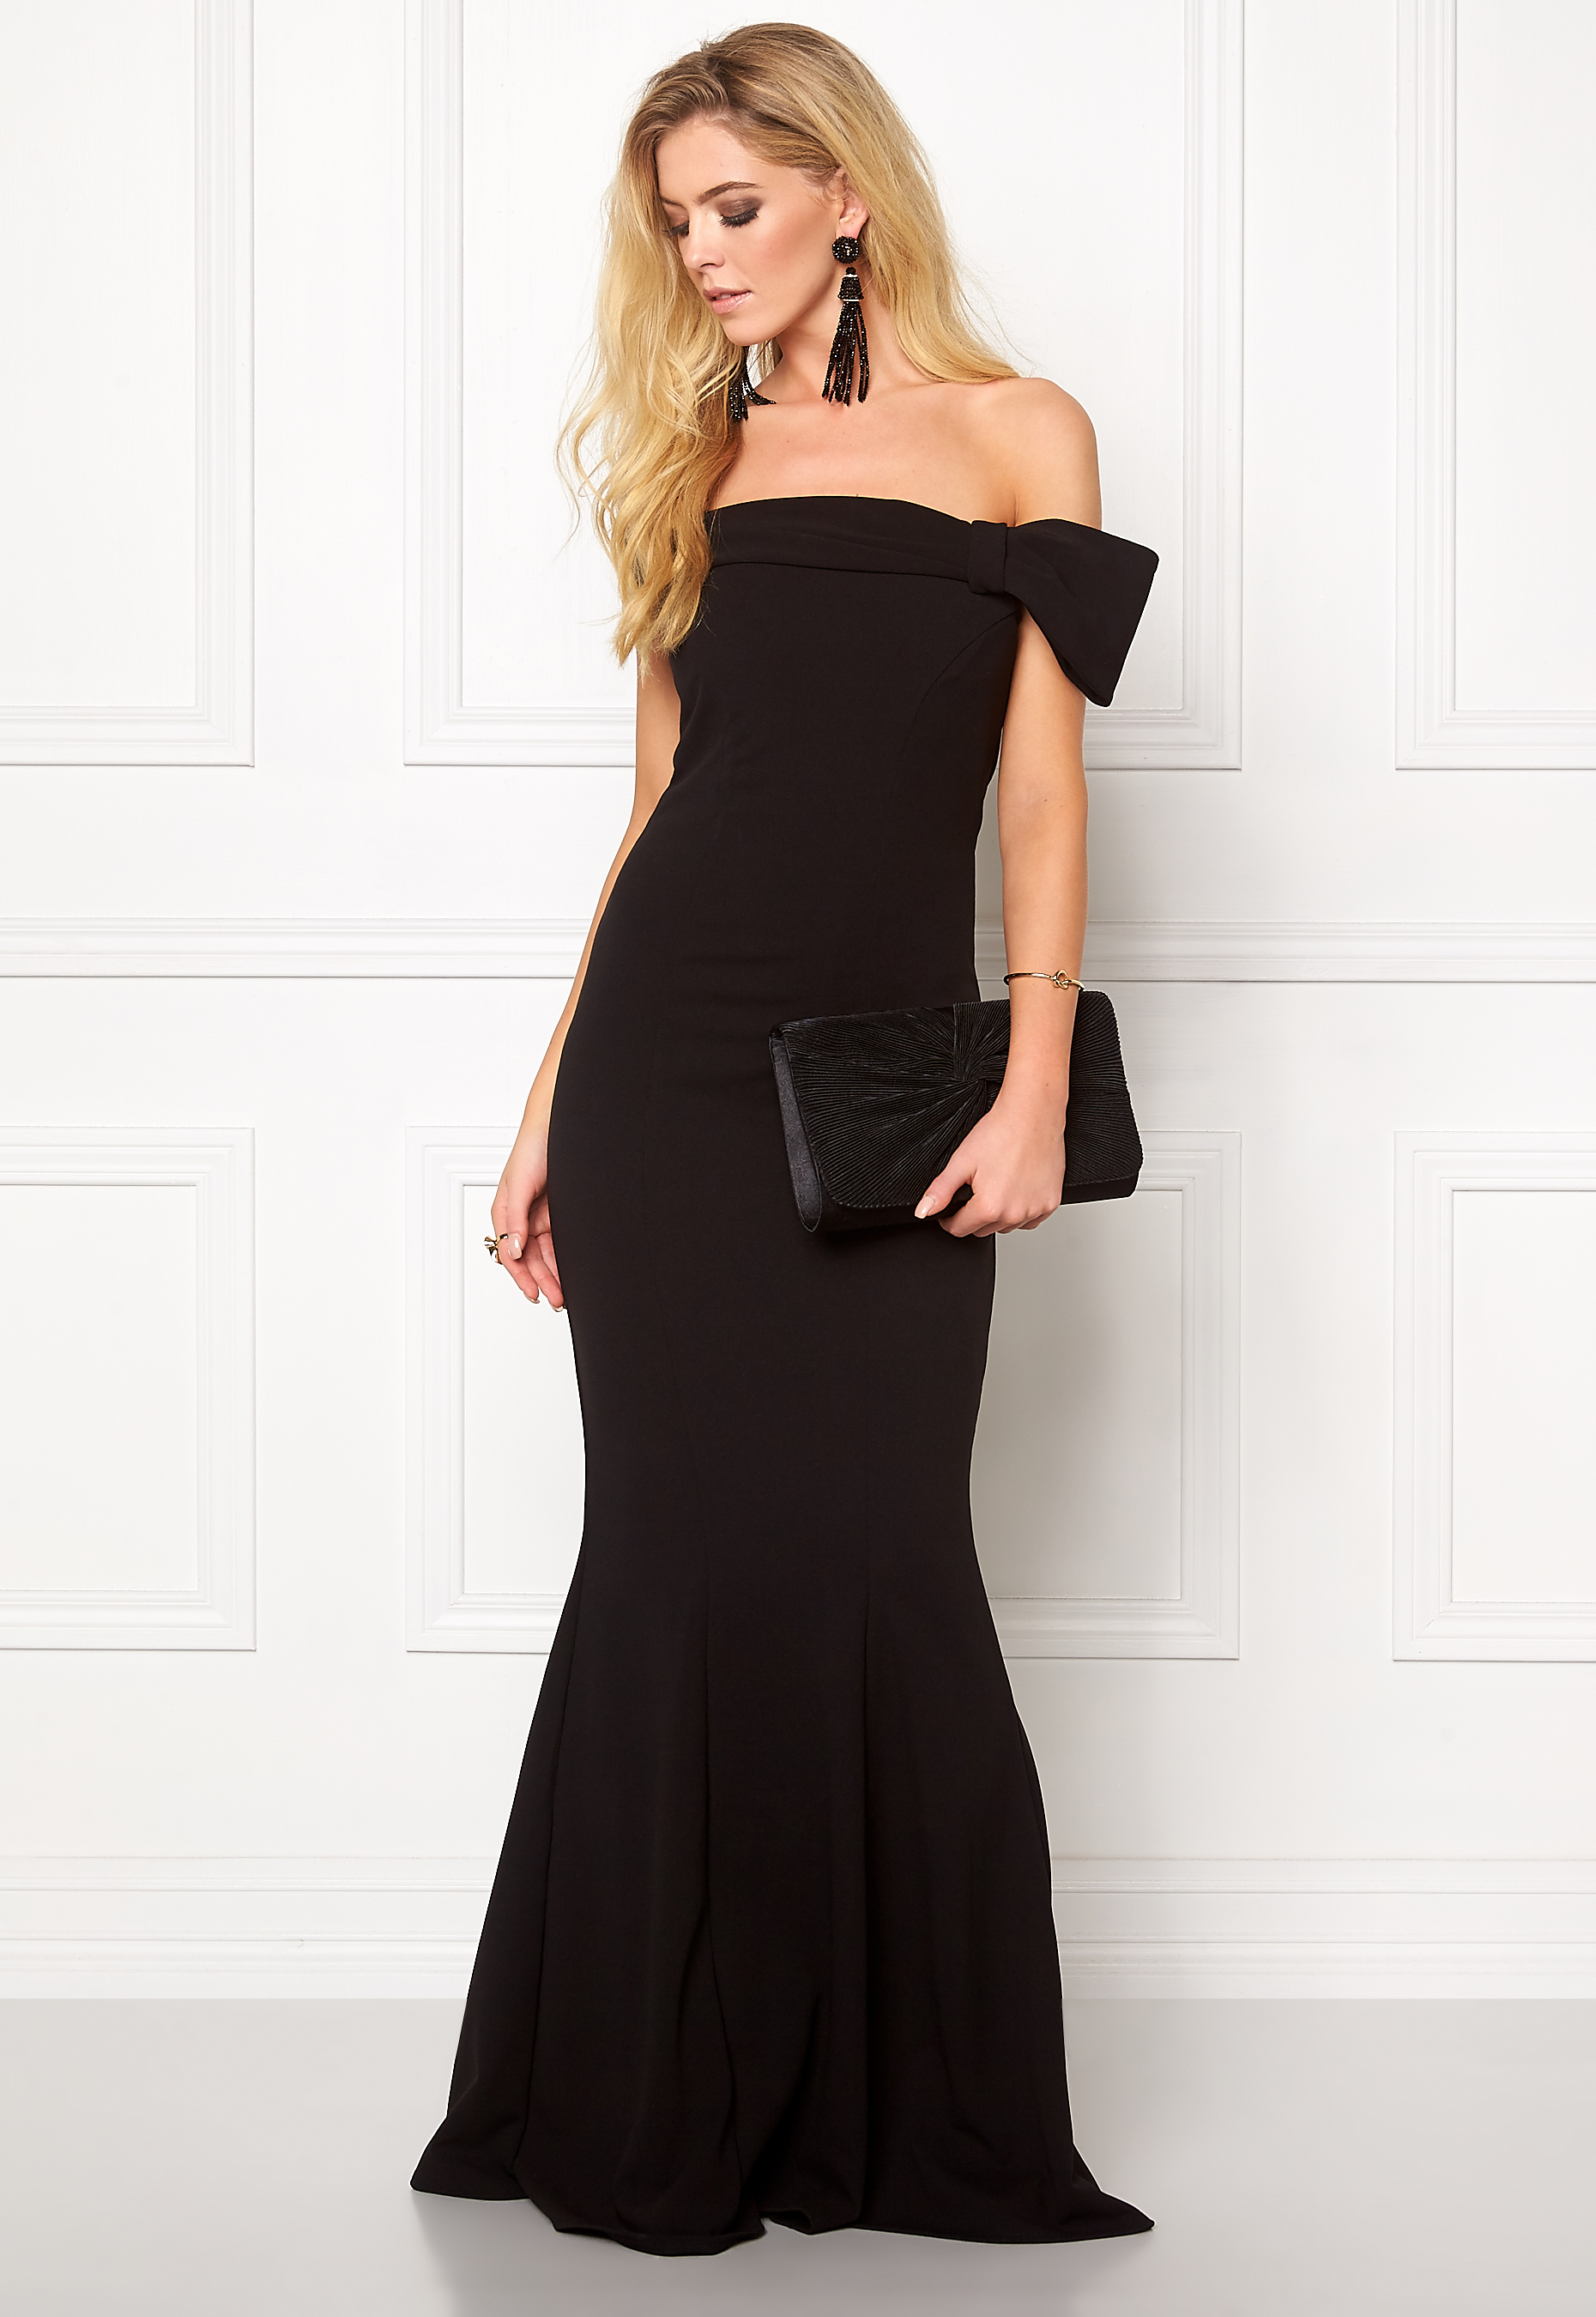 8802c10ba480 Goddiva Bardot Fishtail Maxi Dress Black - Bubbleroom